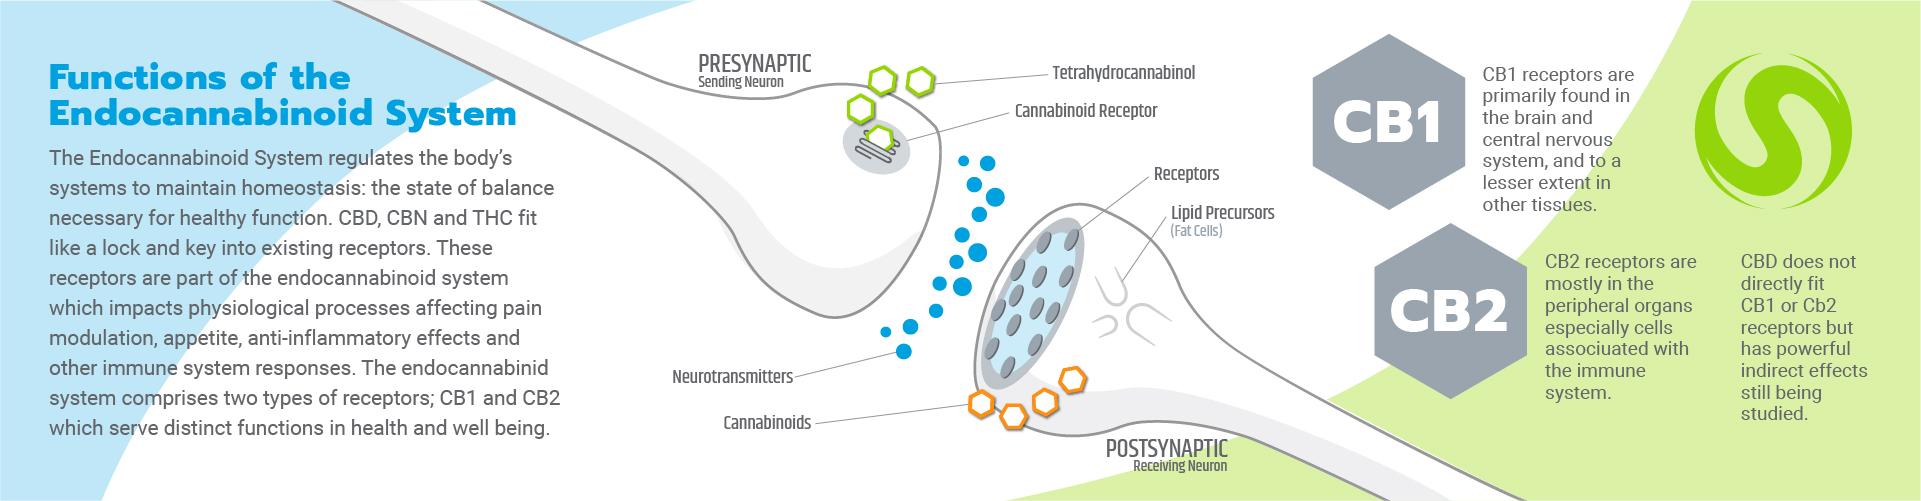 visualizes cb1 cb2 receptors and endocannabinoid receptor